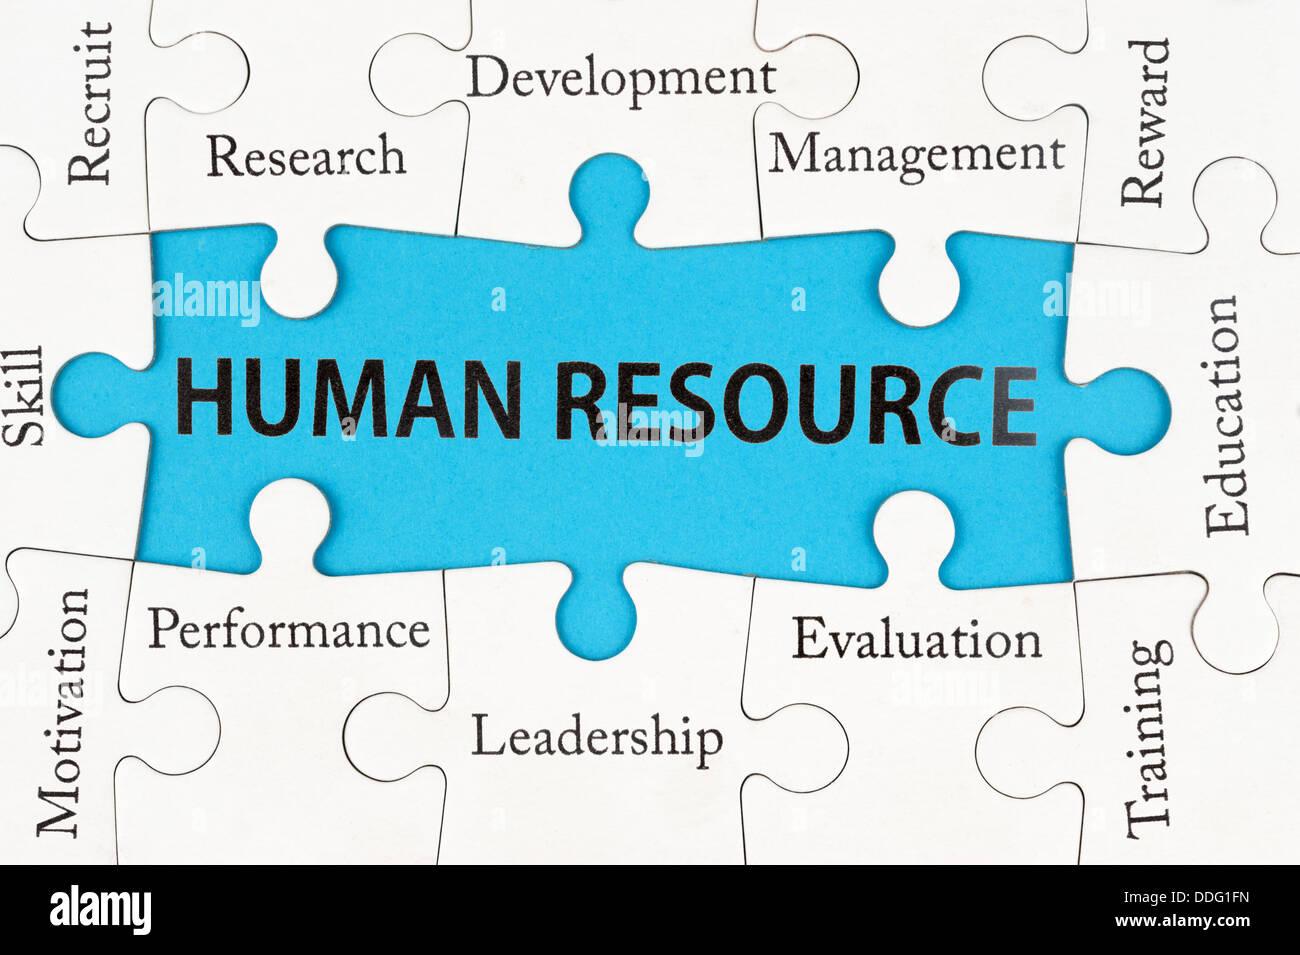 Human Resource Concept Imágenes De Stock & Human Resource Concept ...